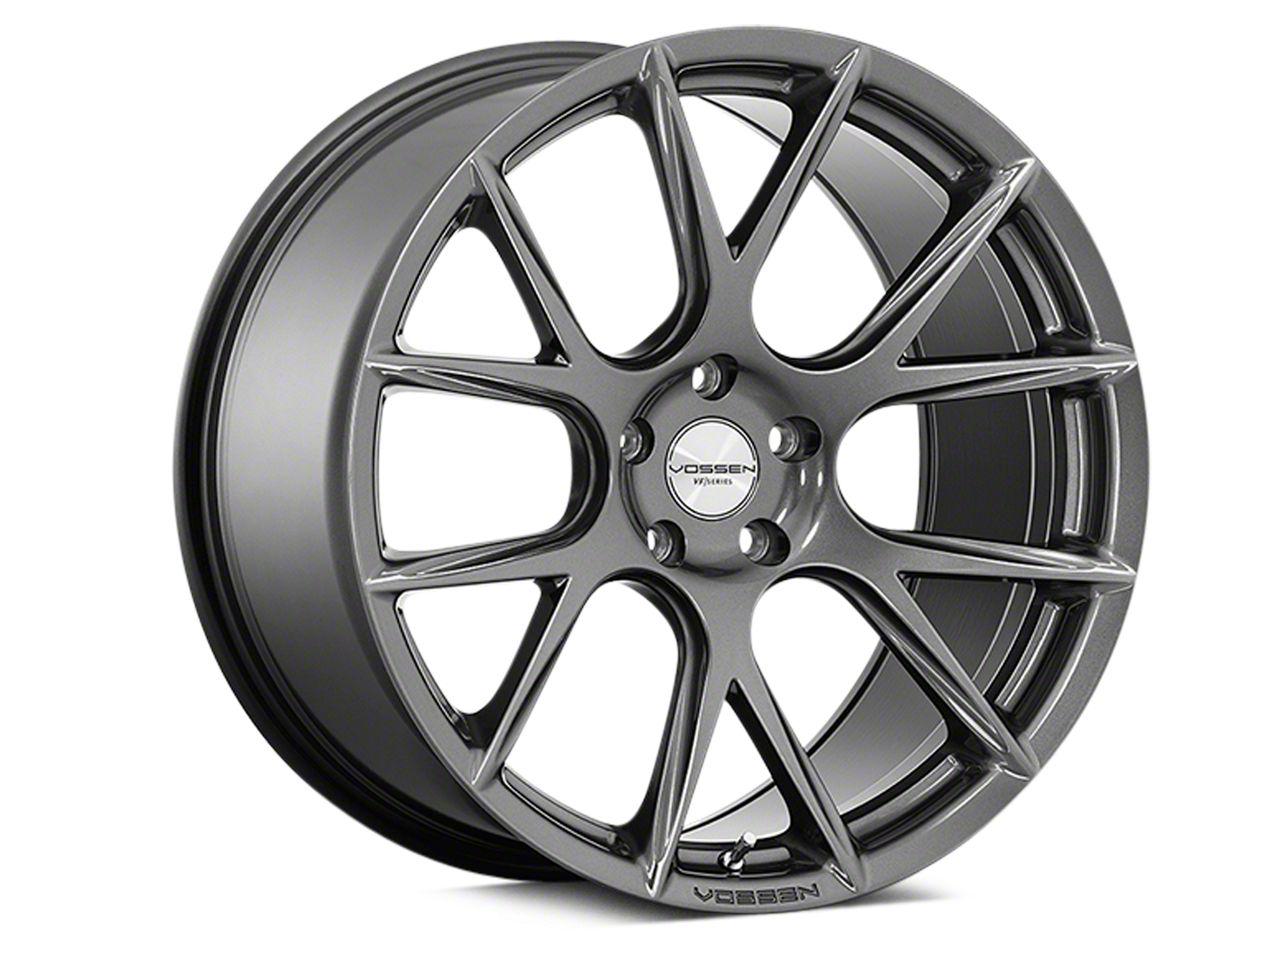 Vossen VFS-6 Gloss Graphite Wheel - 20x10.5 - Rear Only (15-19 All)